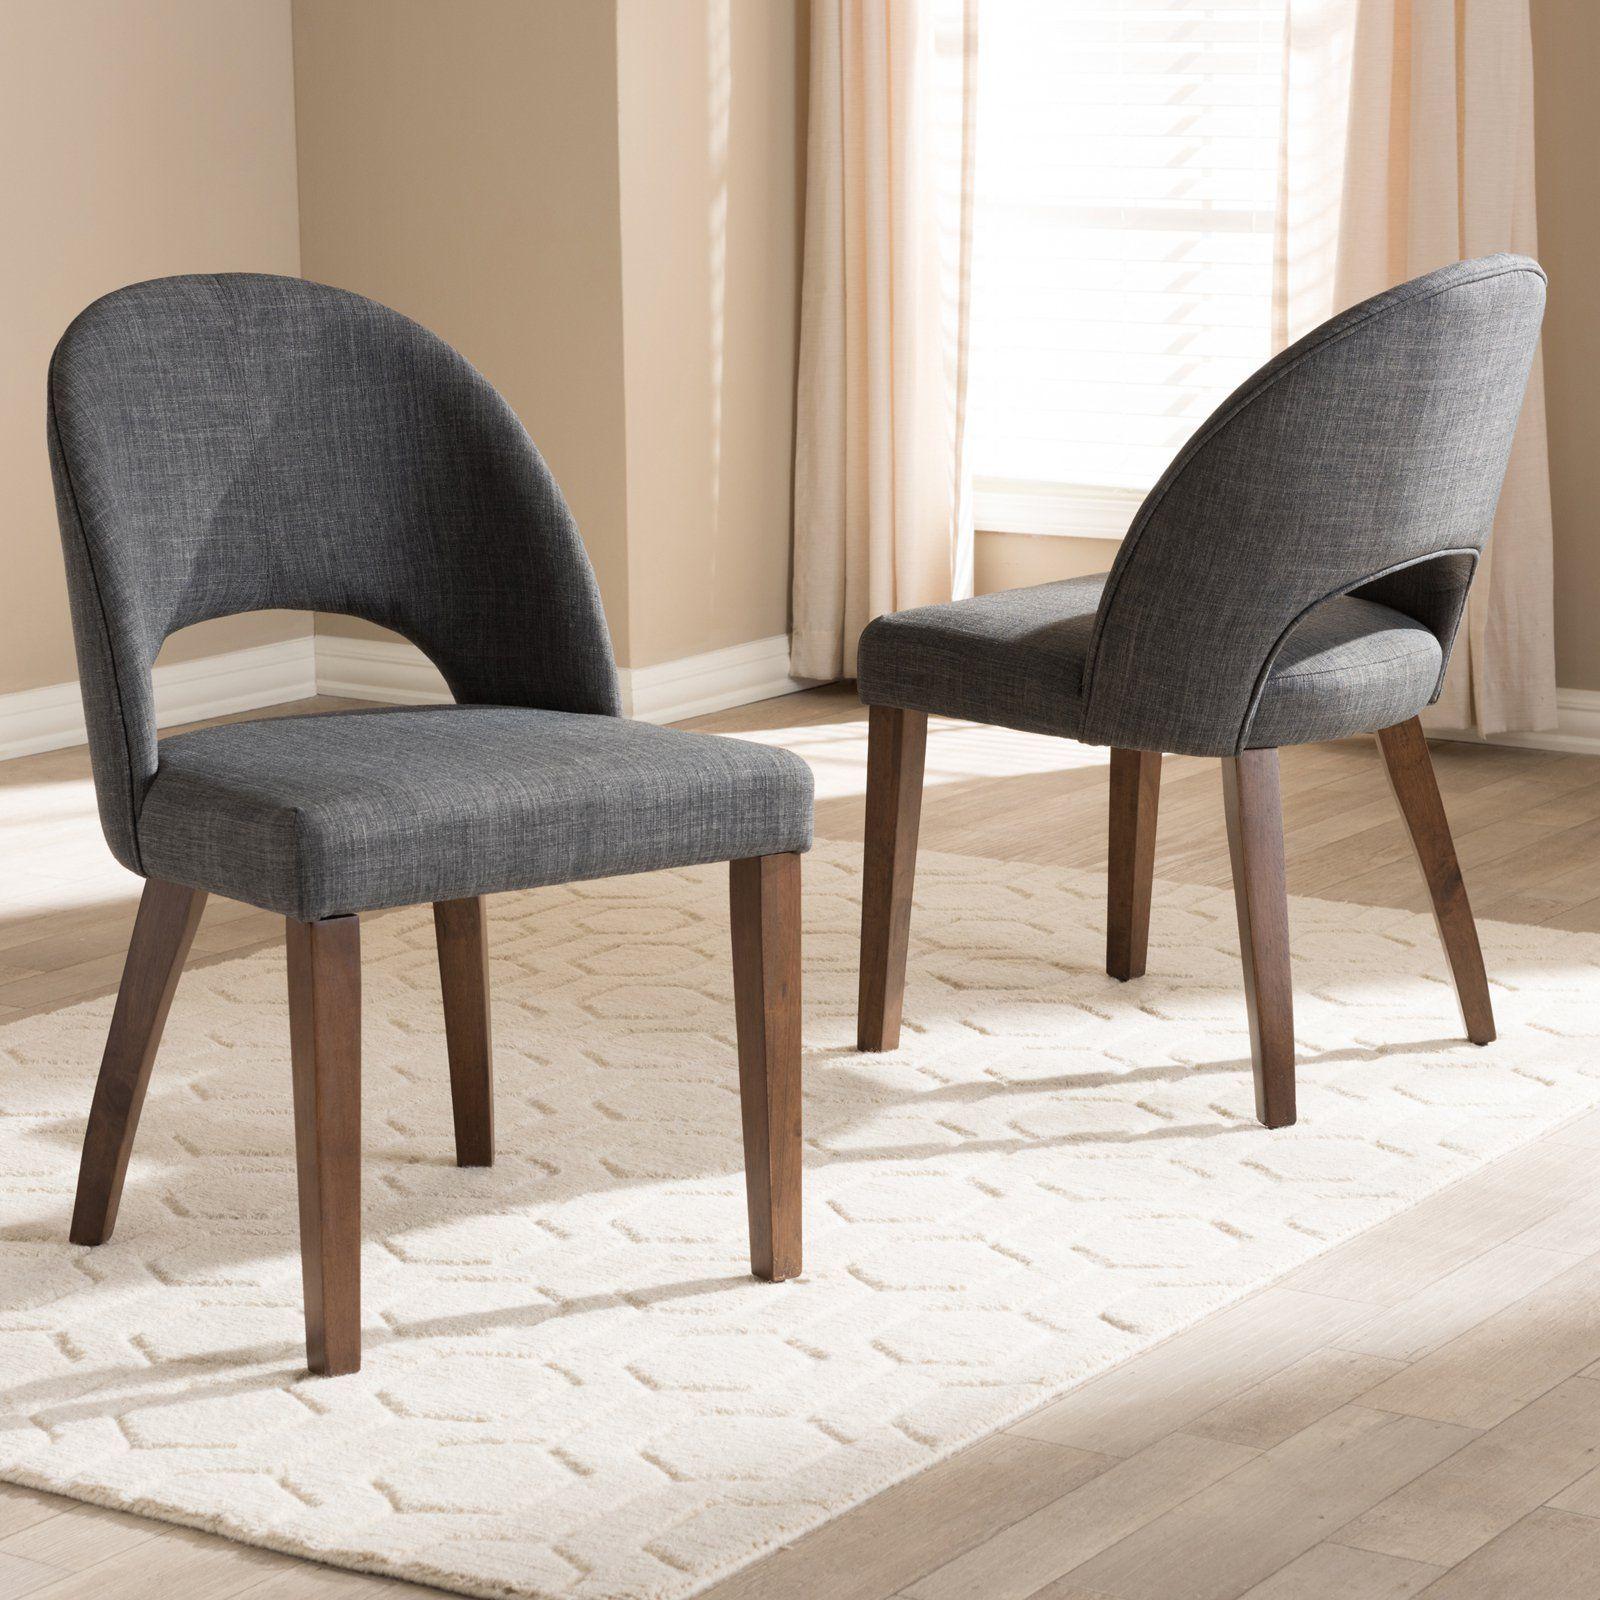 Baxton Studio Wesley Mid Century Modern Fabric Upholstered Wood